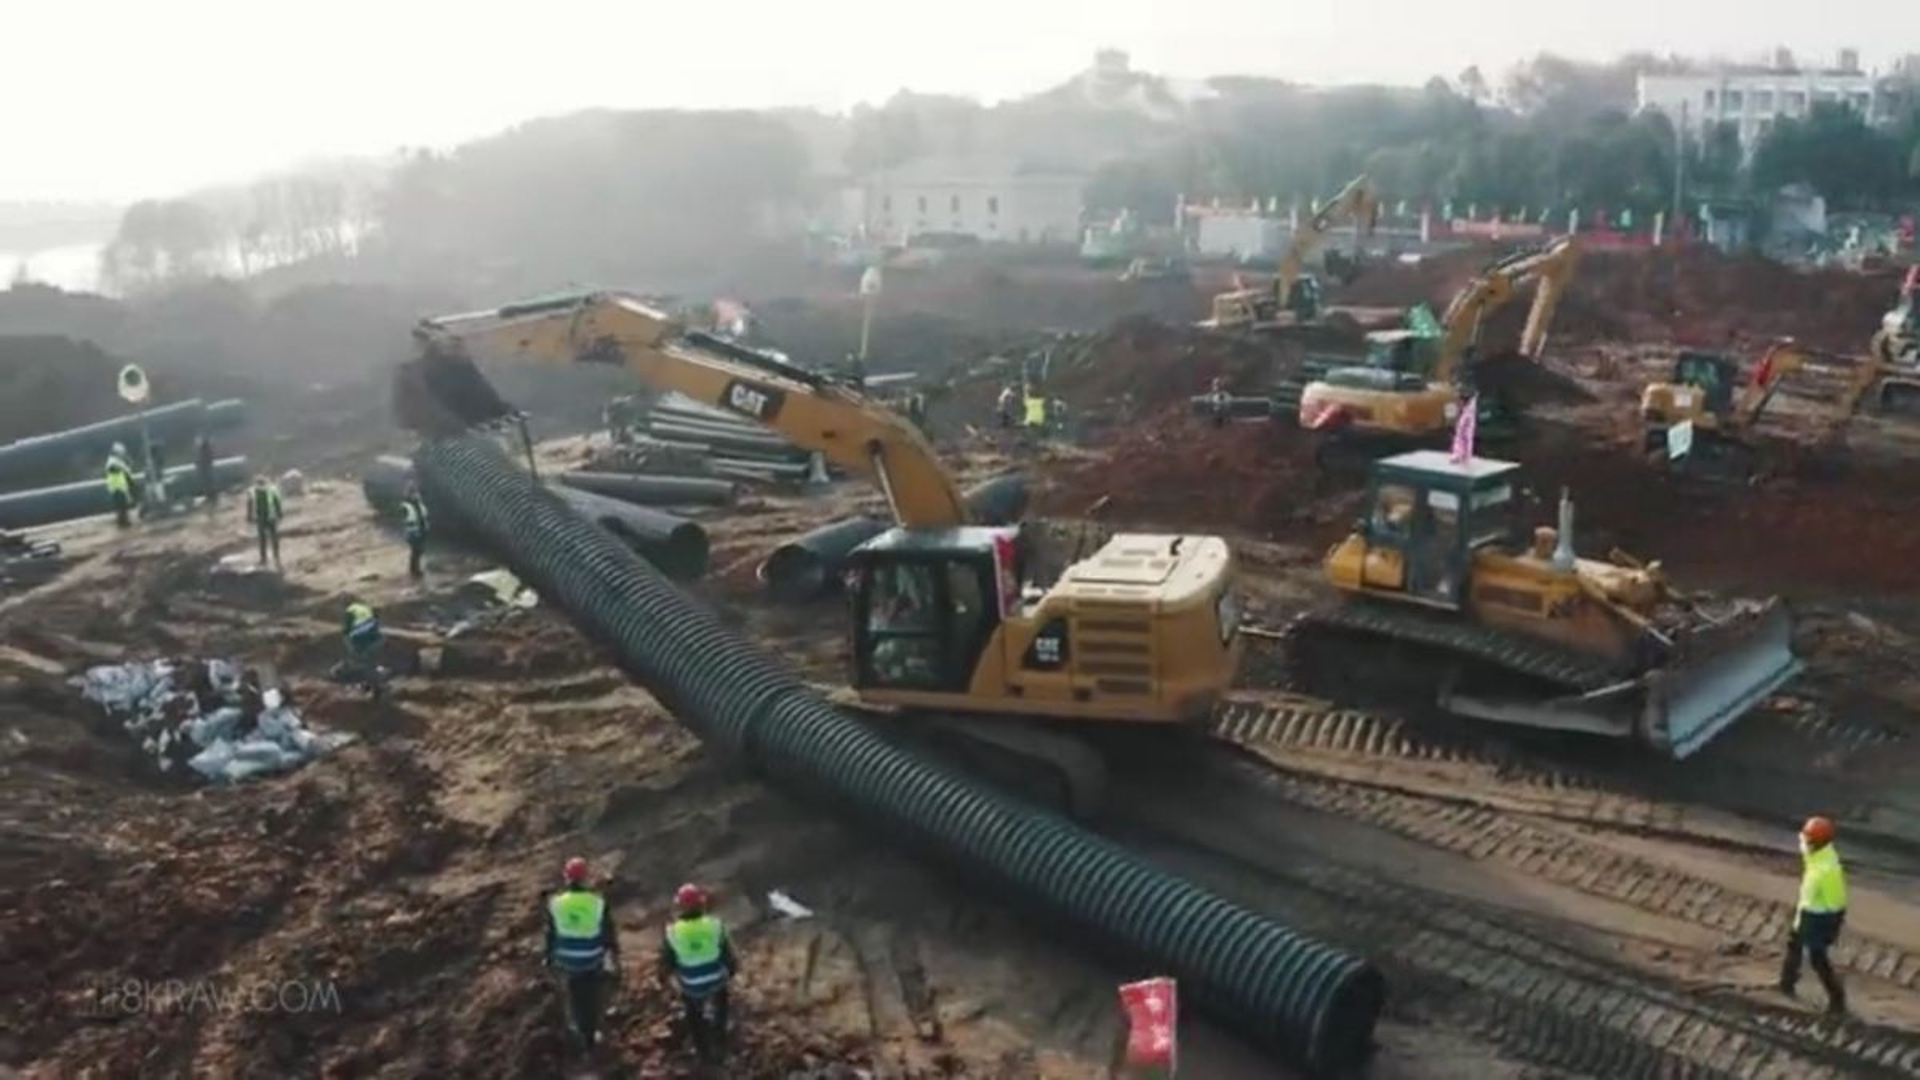 Helping in Wuhan